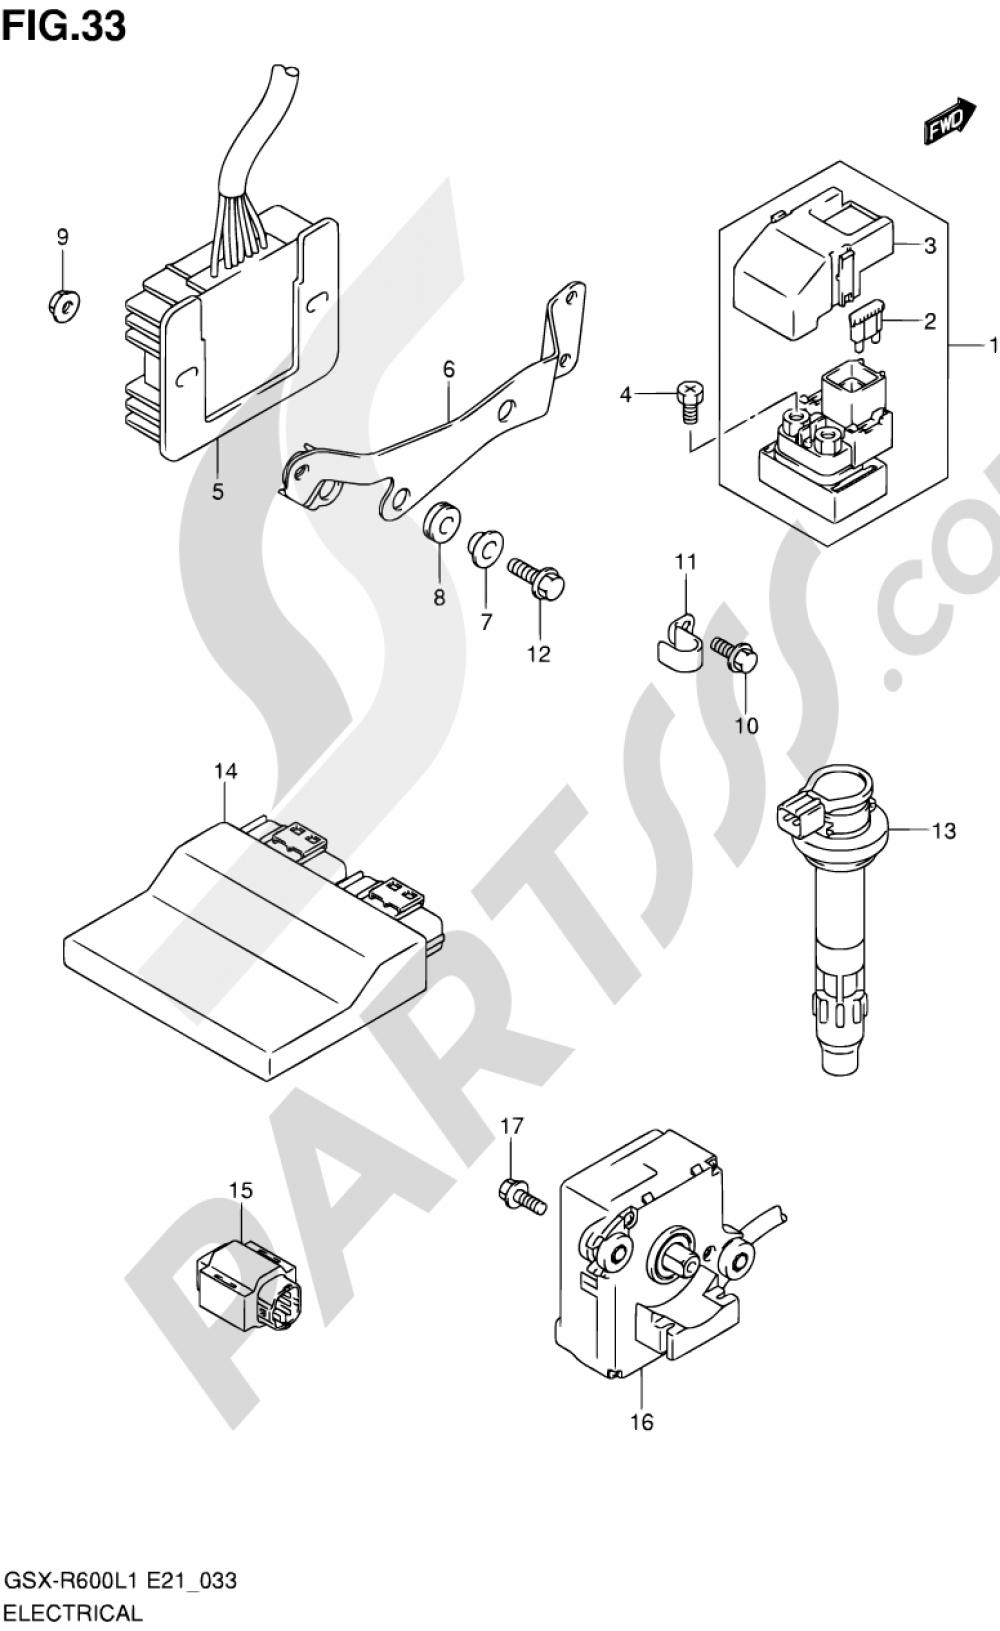 33 - ELECTRICAL (GSX-R600UEL1 E21) Suzuki GSX-R600 2011